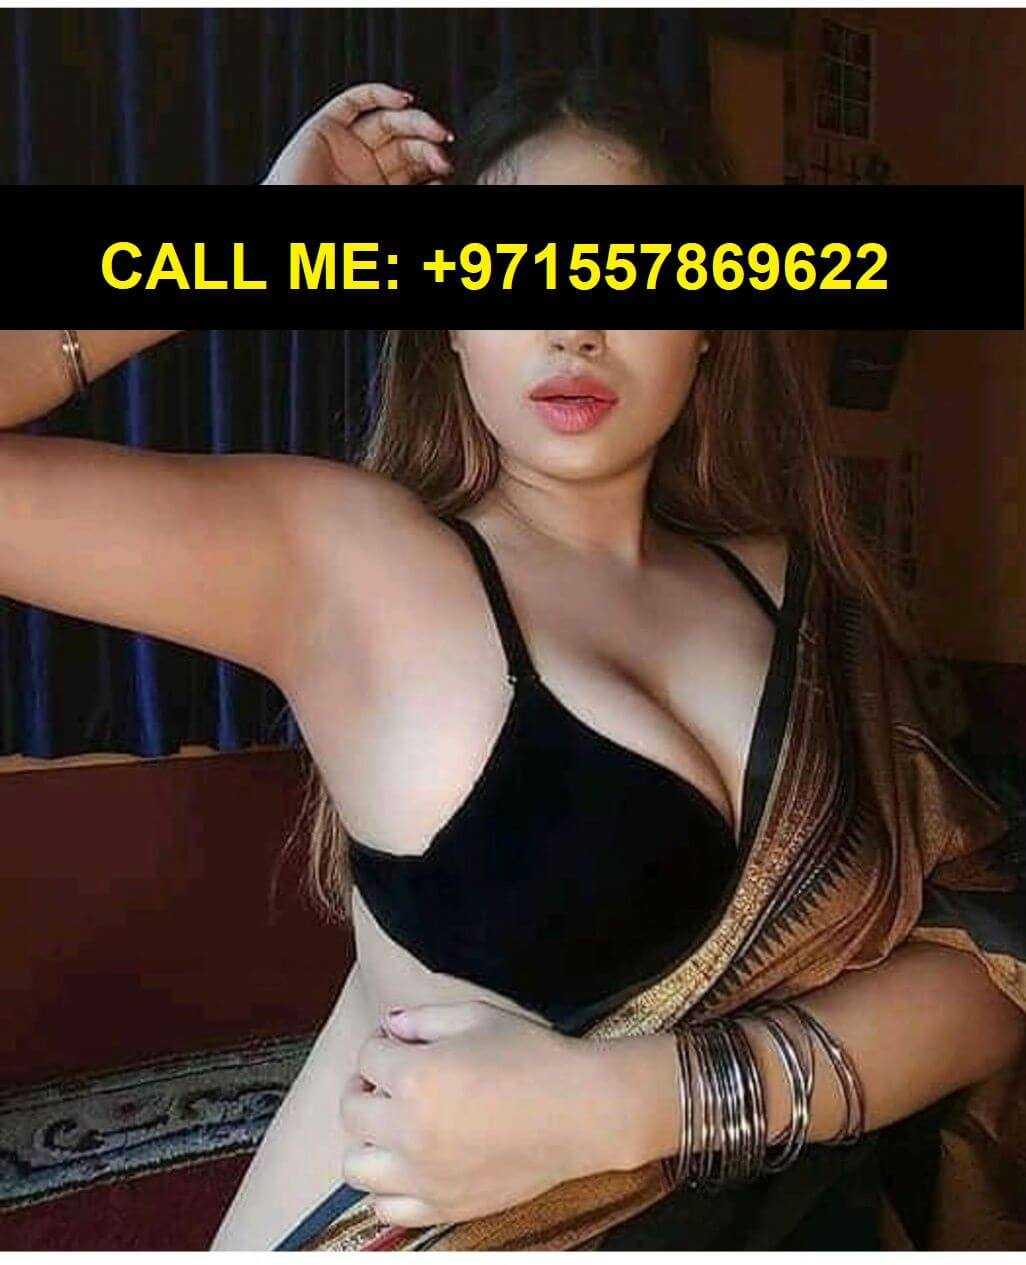 CaLL +971-557869622 VIP #Call #Girls Near ExPo DuBai UAE